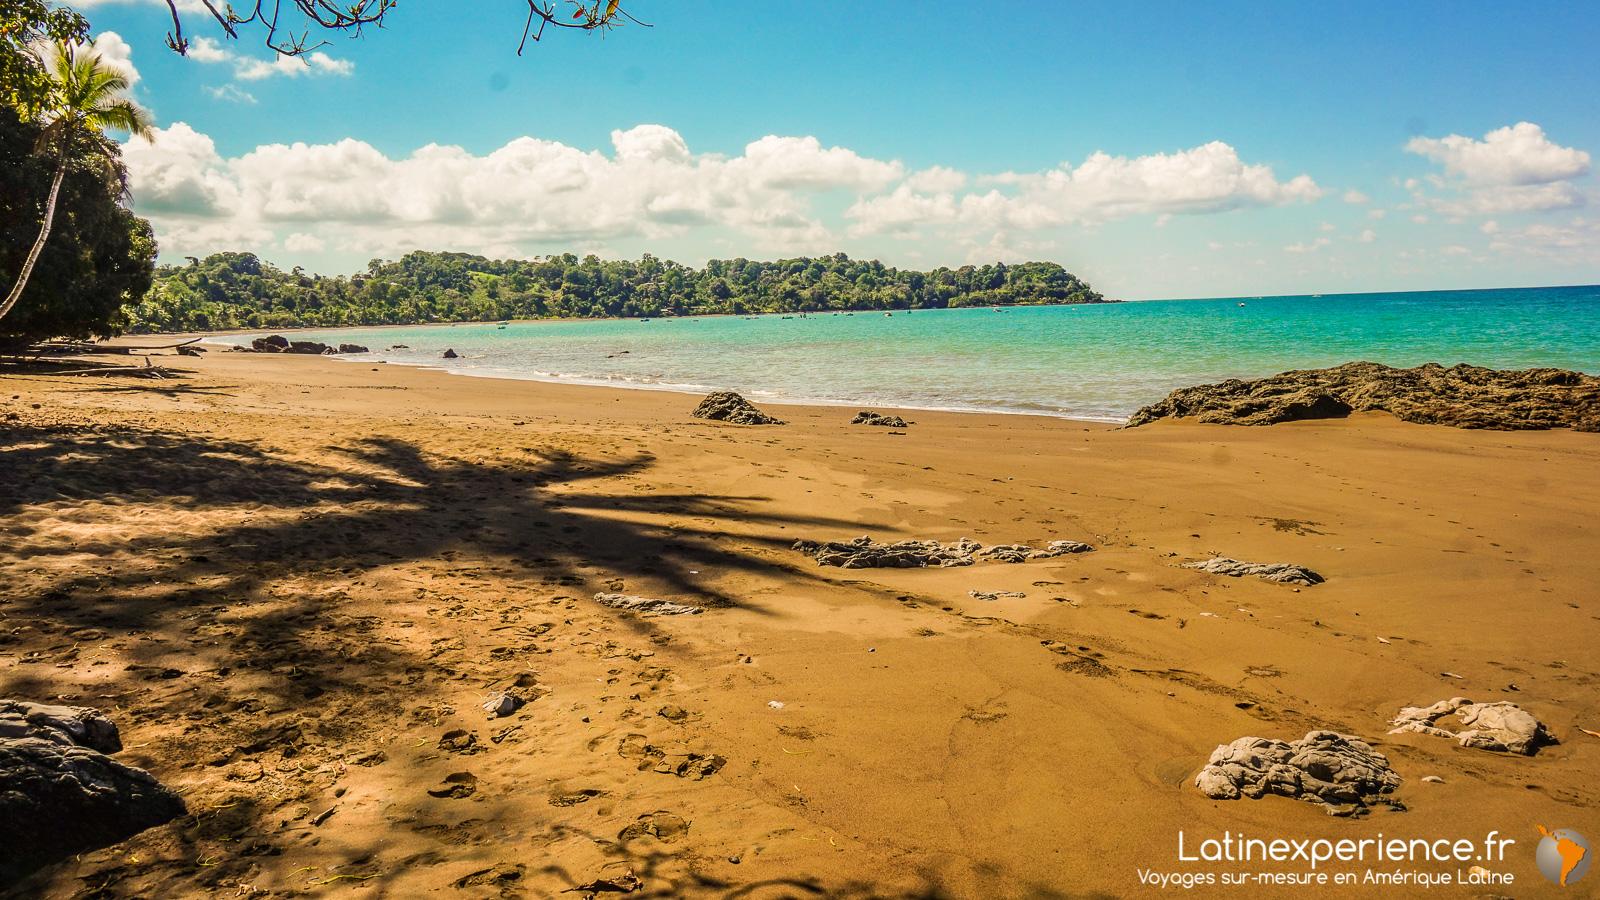 Costa Rica - Plage Drake Bay - Latinexperience voyages